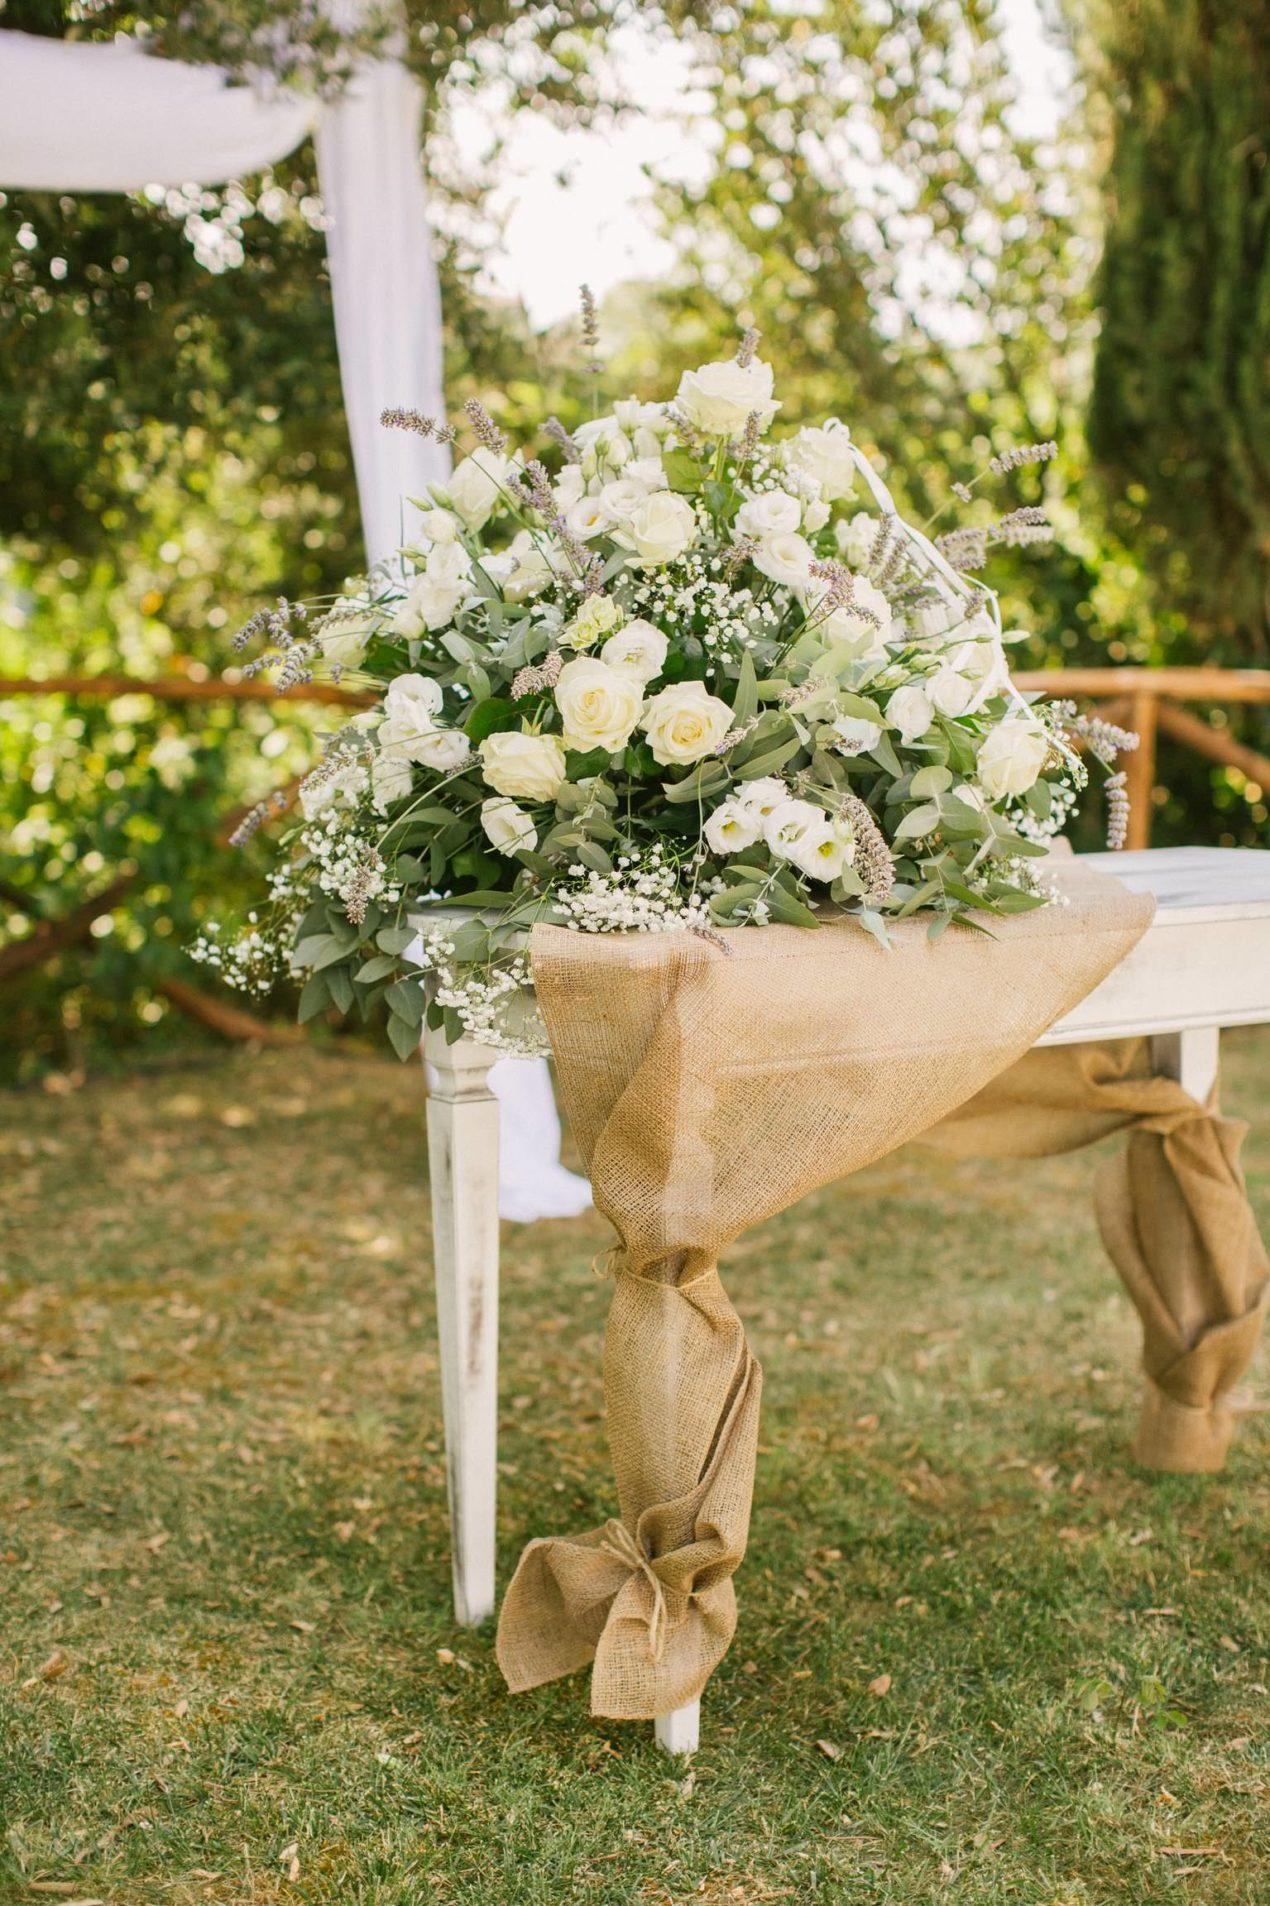 matrimonio-pienza-015-635x953@2x.jpg